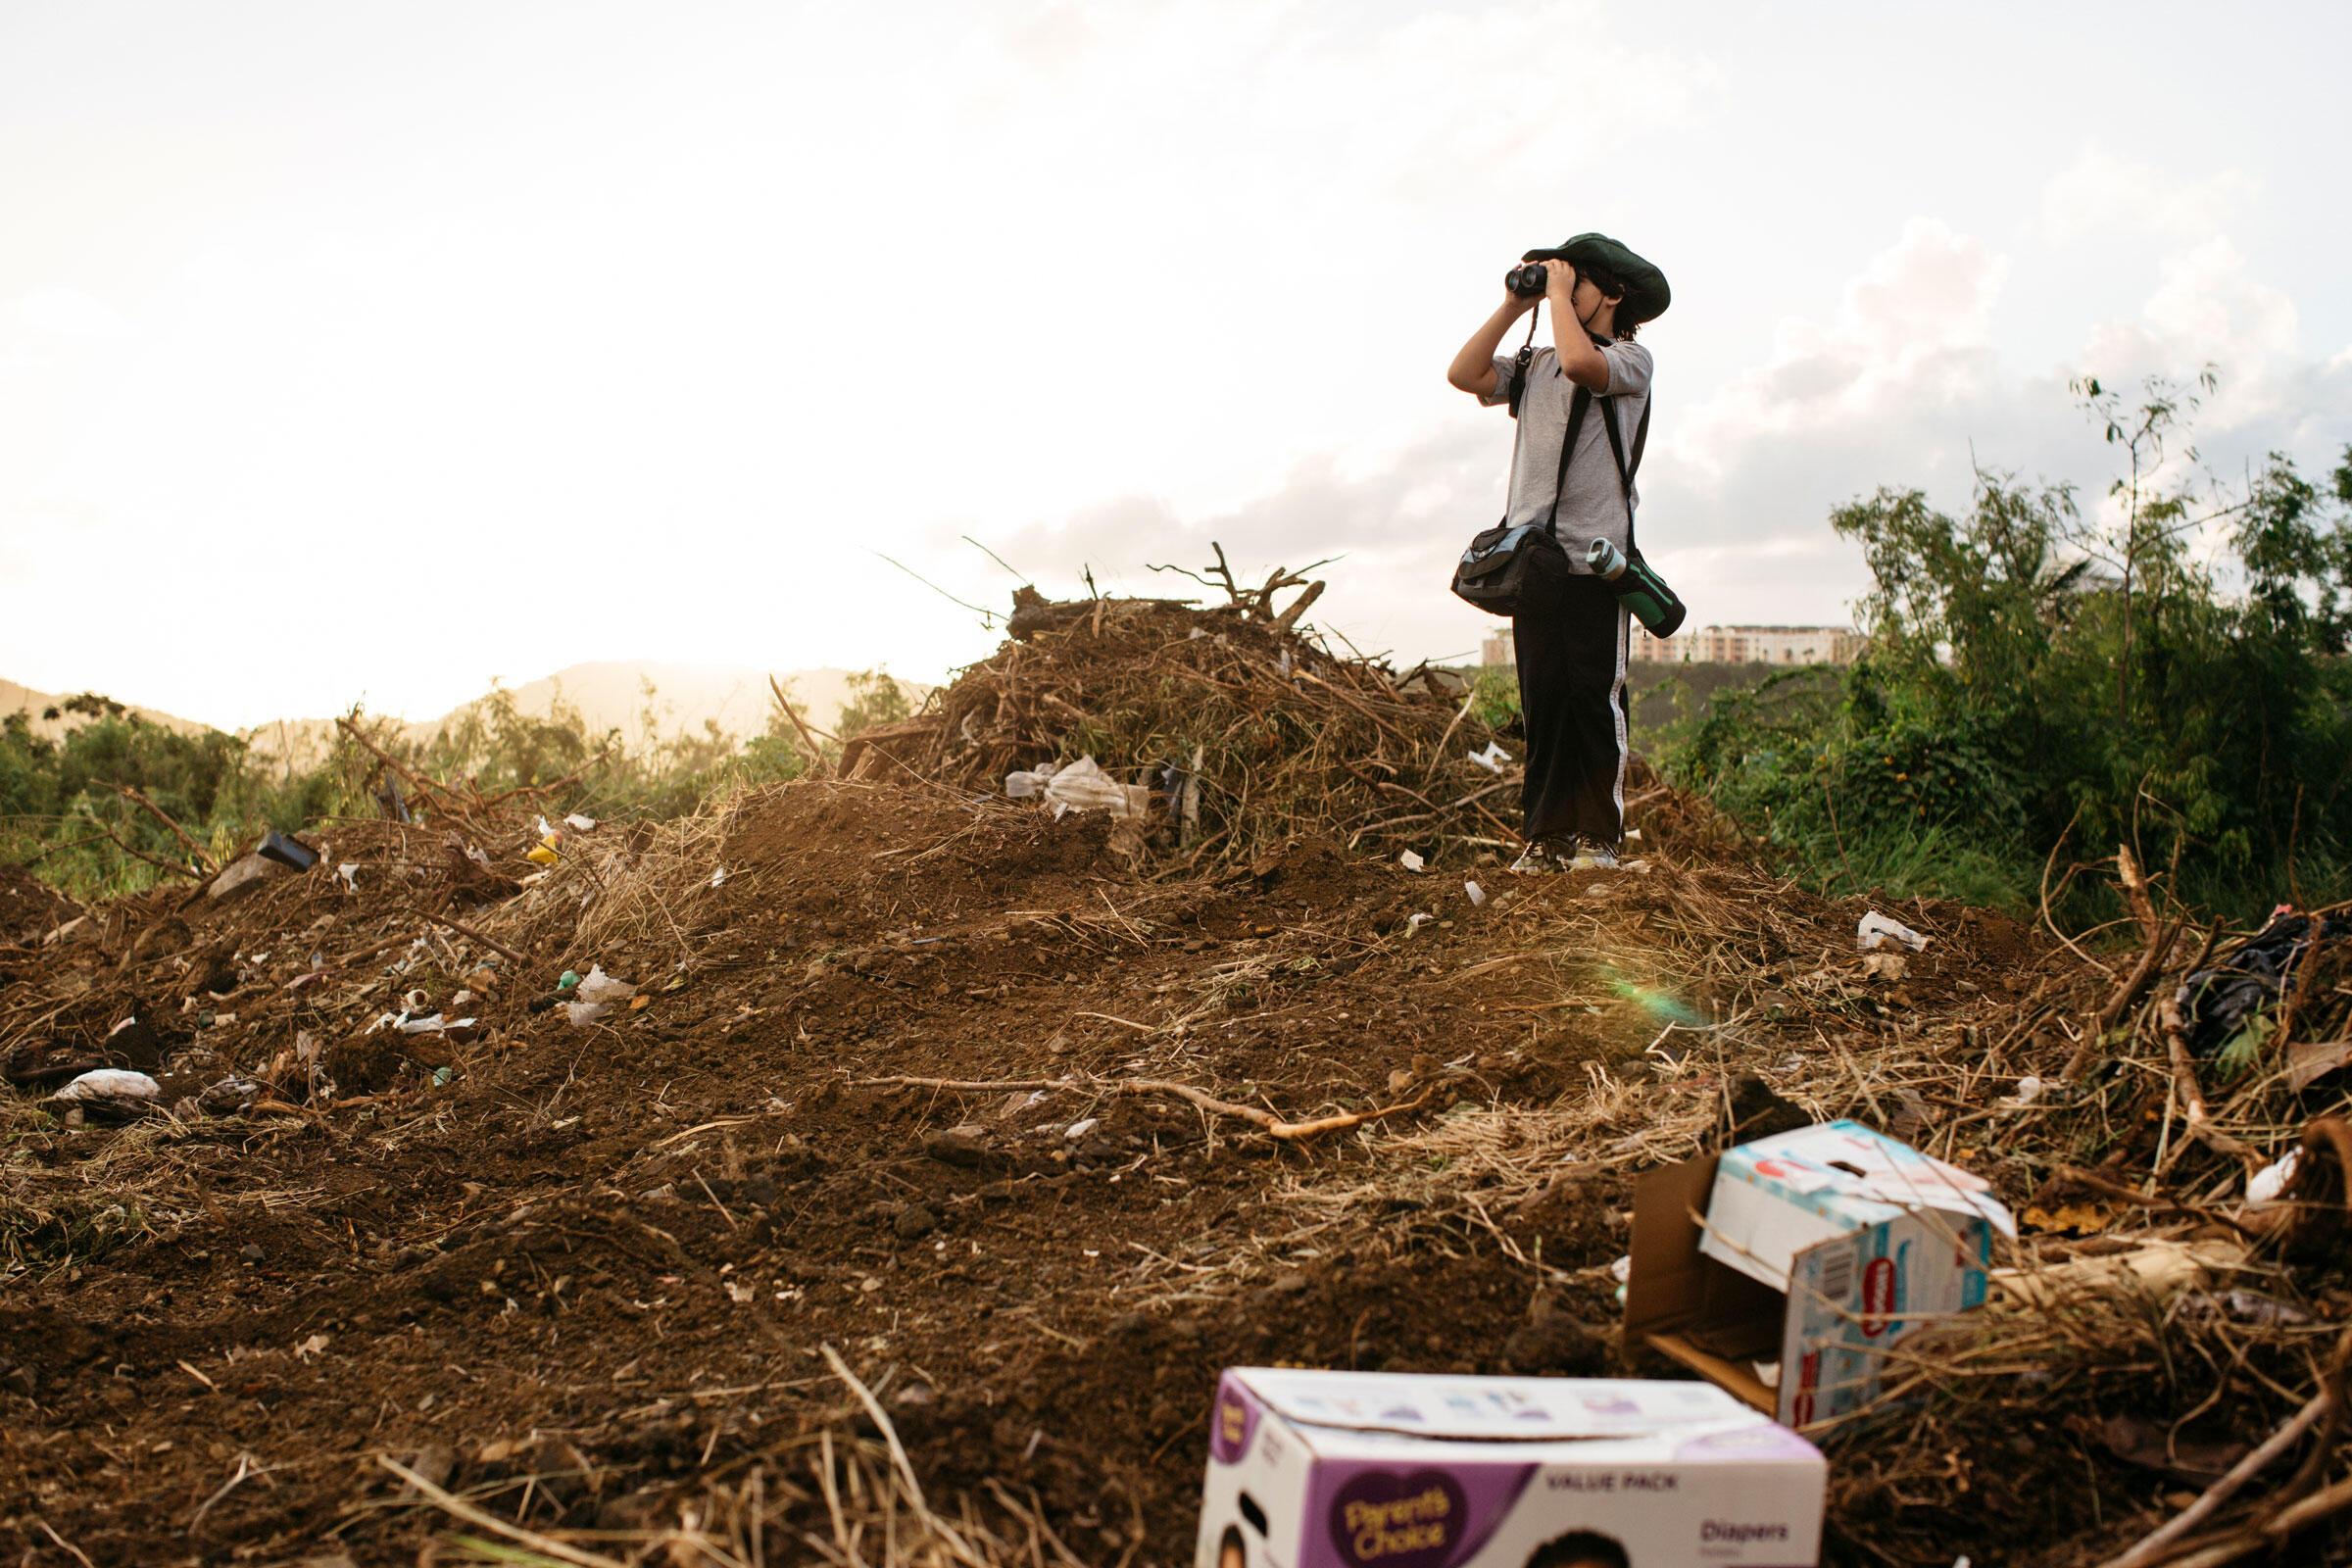 Jordi Salguero Roig, 10, searches for birds amid debris from Hurricane Maria. Erika P. Rodriguez